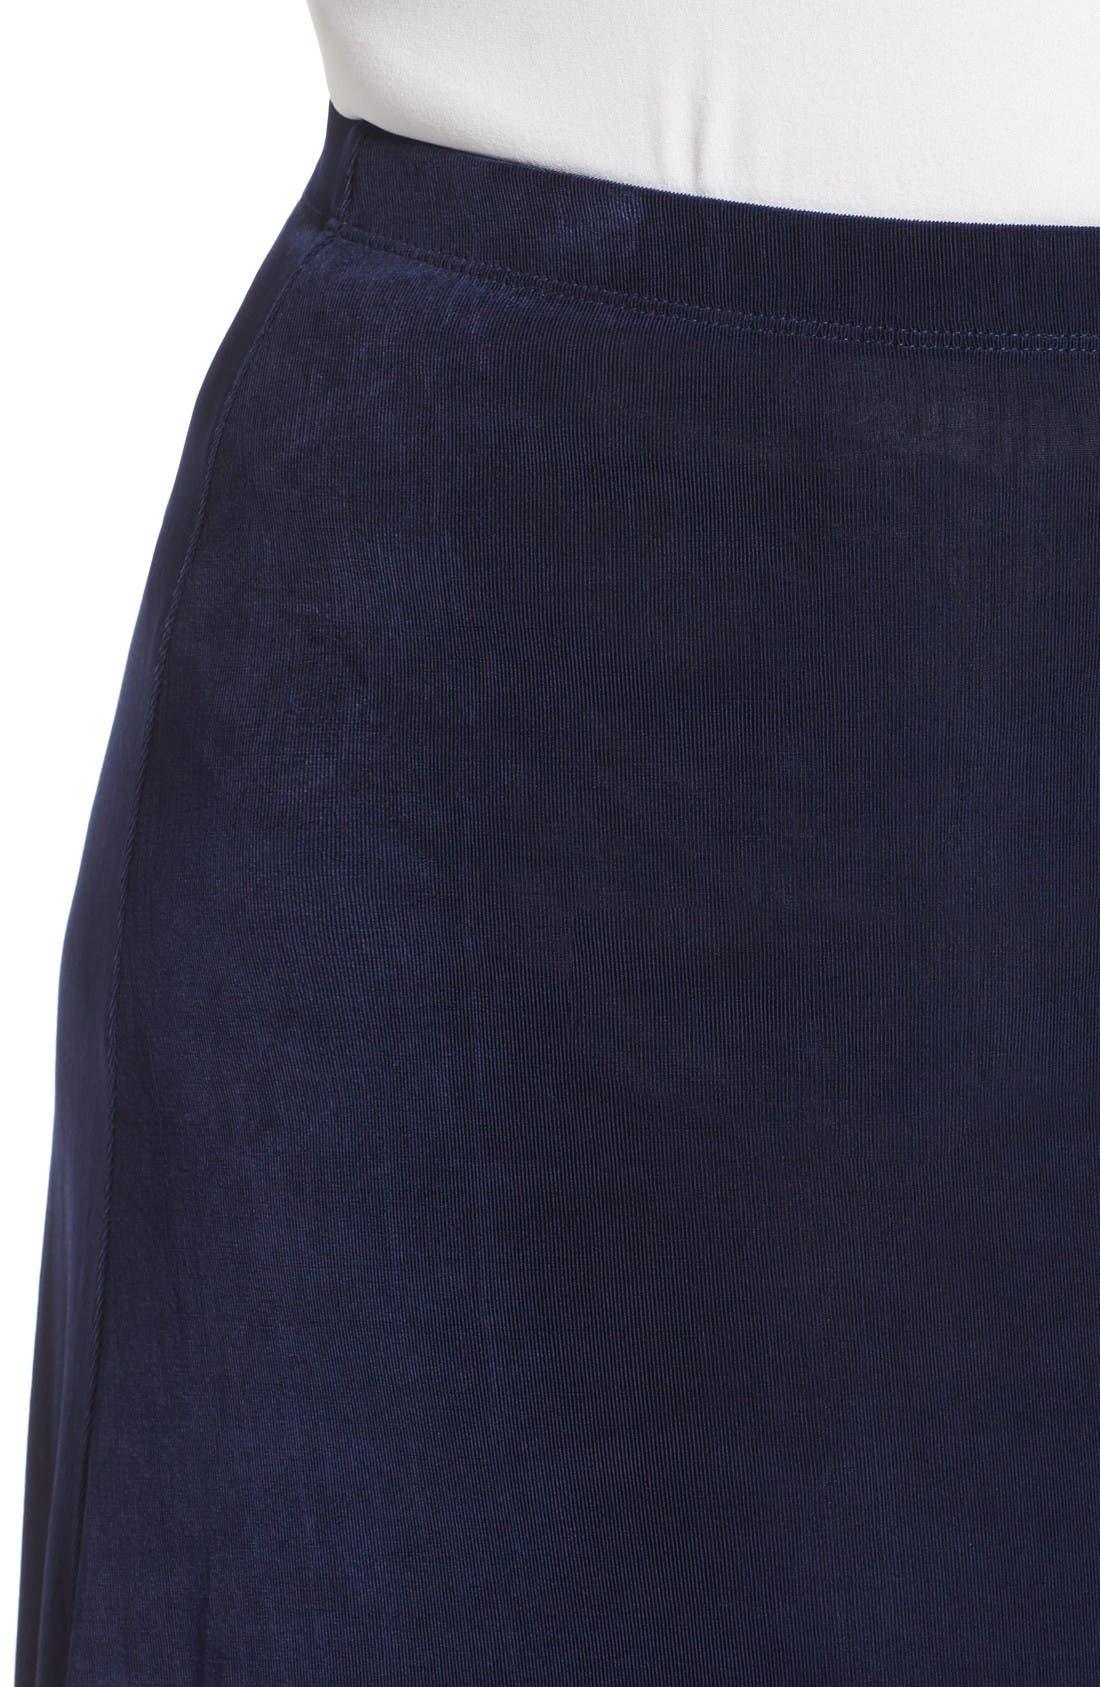 Long A-Line Skirt,                             Alternate thumbnail 4, color,                             Navy